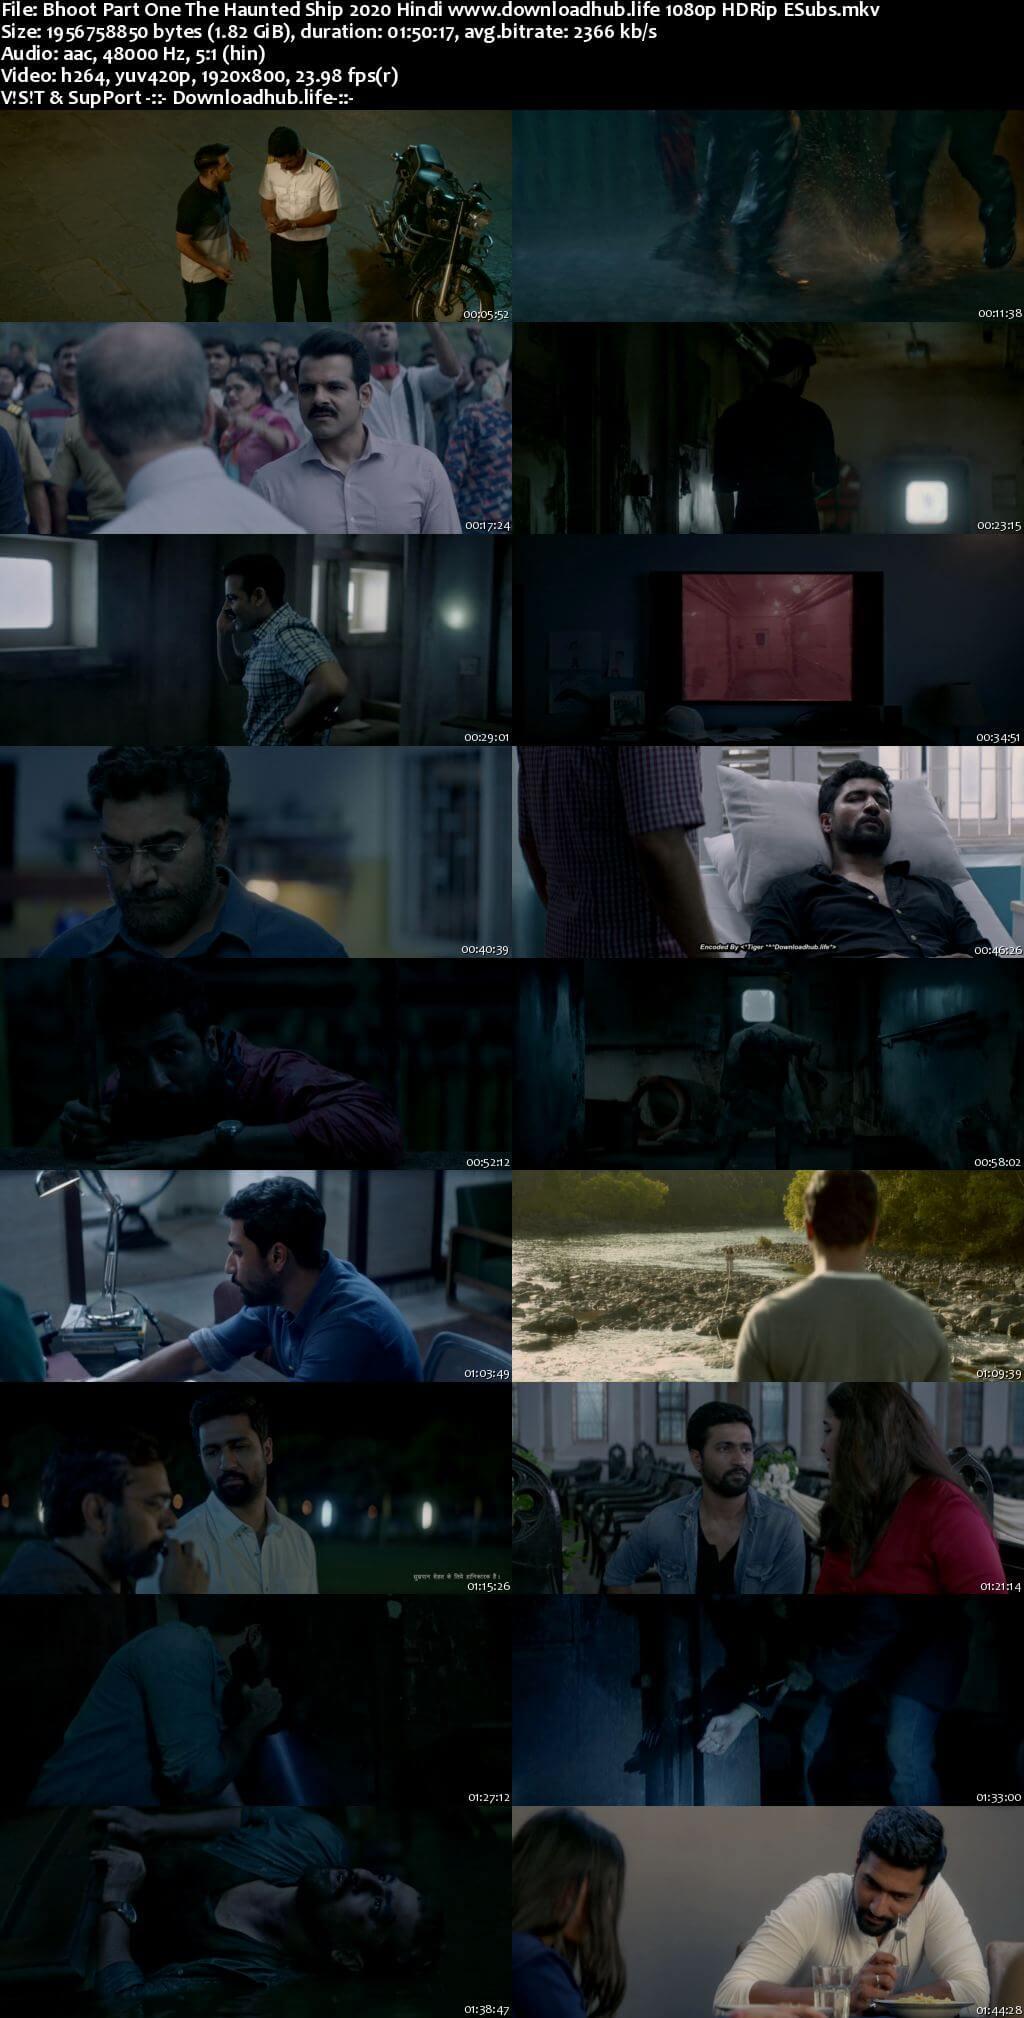 Bhoot Part One The Haunted Ship 2020 Hindi 1080p HDRip ESubs